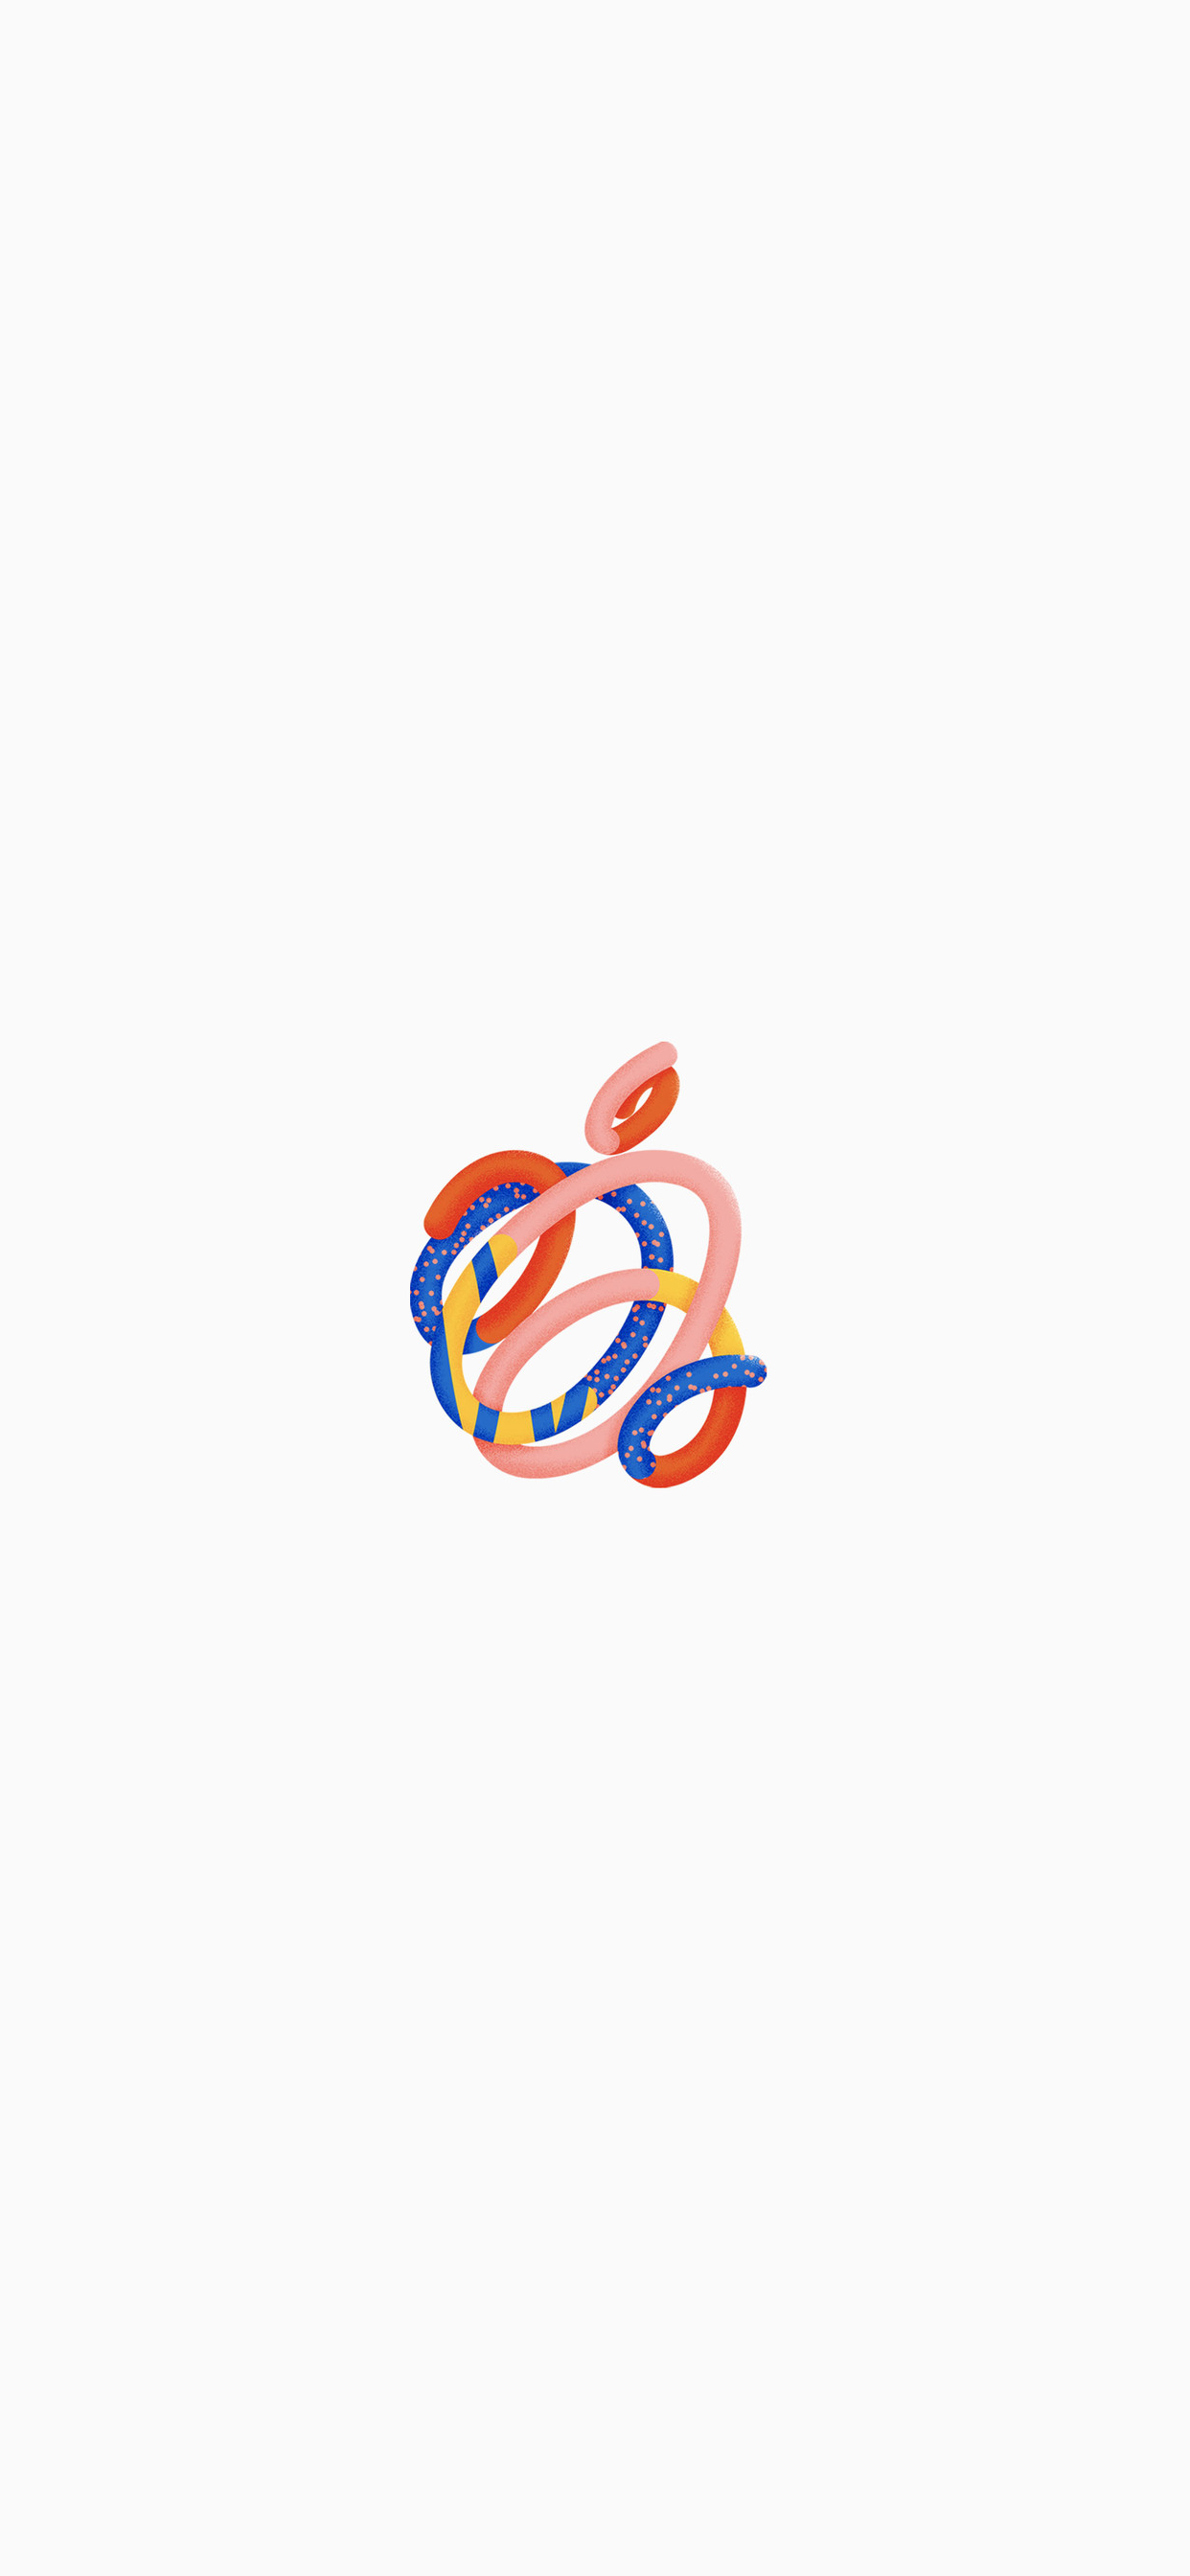 1 Apple logo